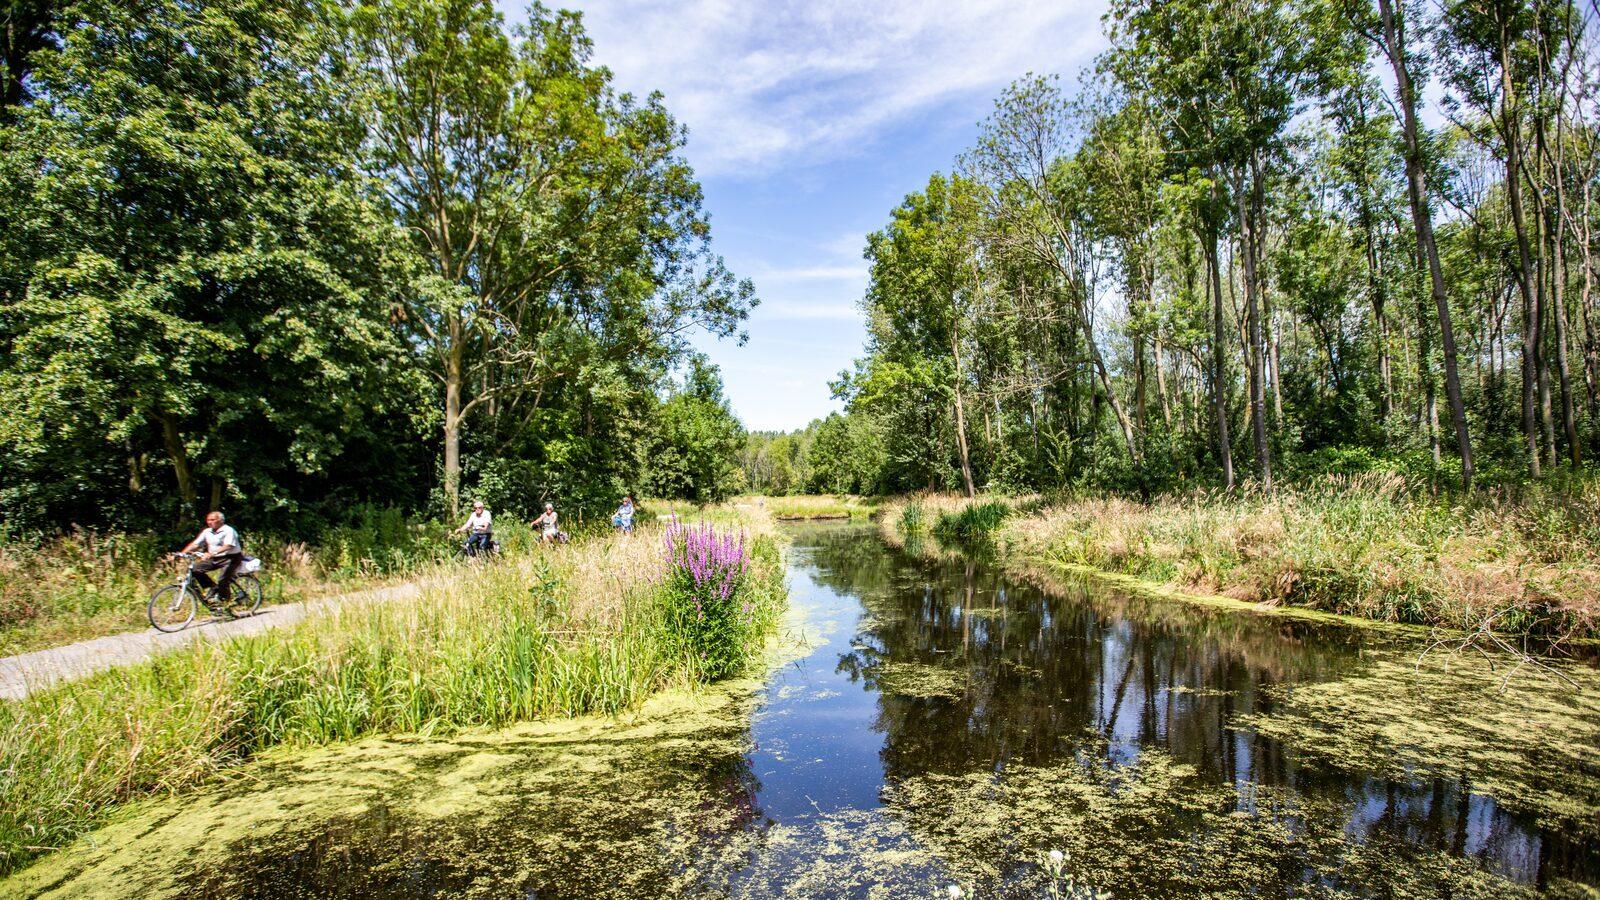 Parc de IJsselhoeve